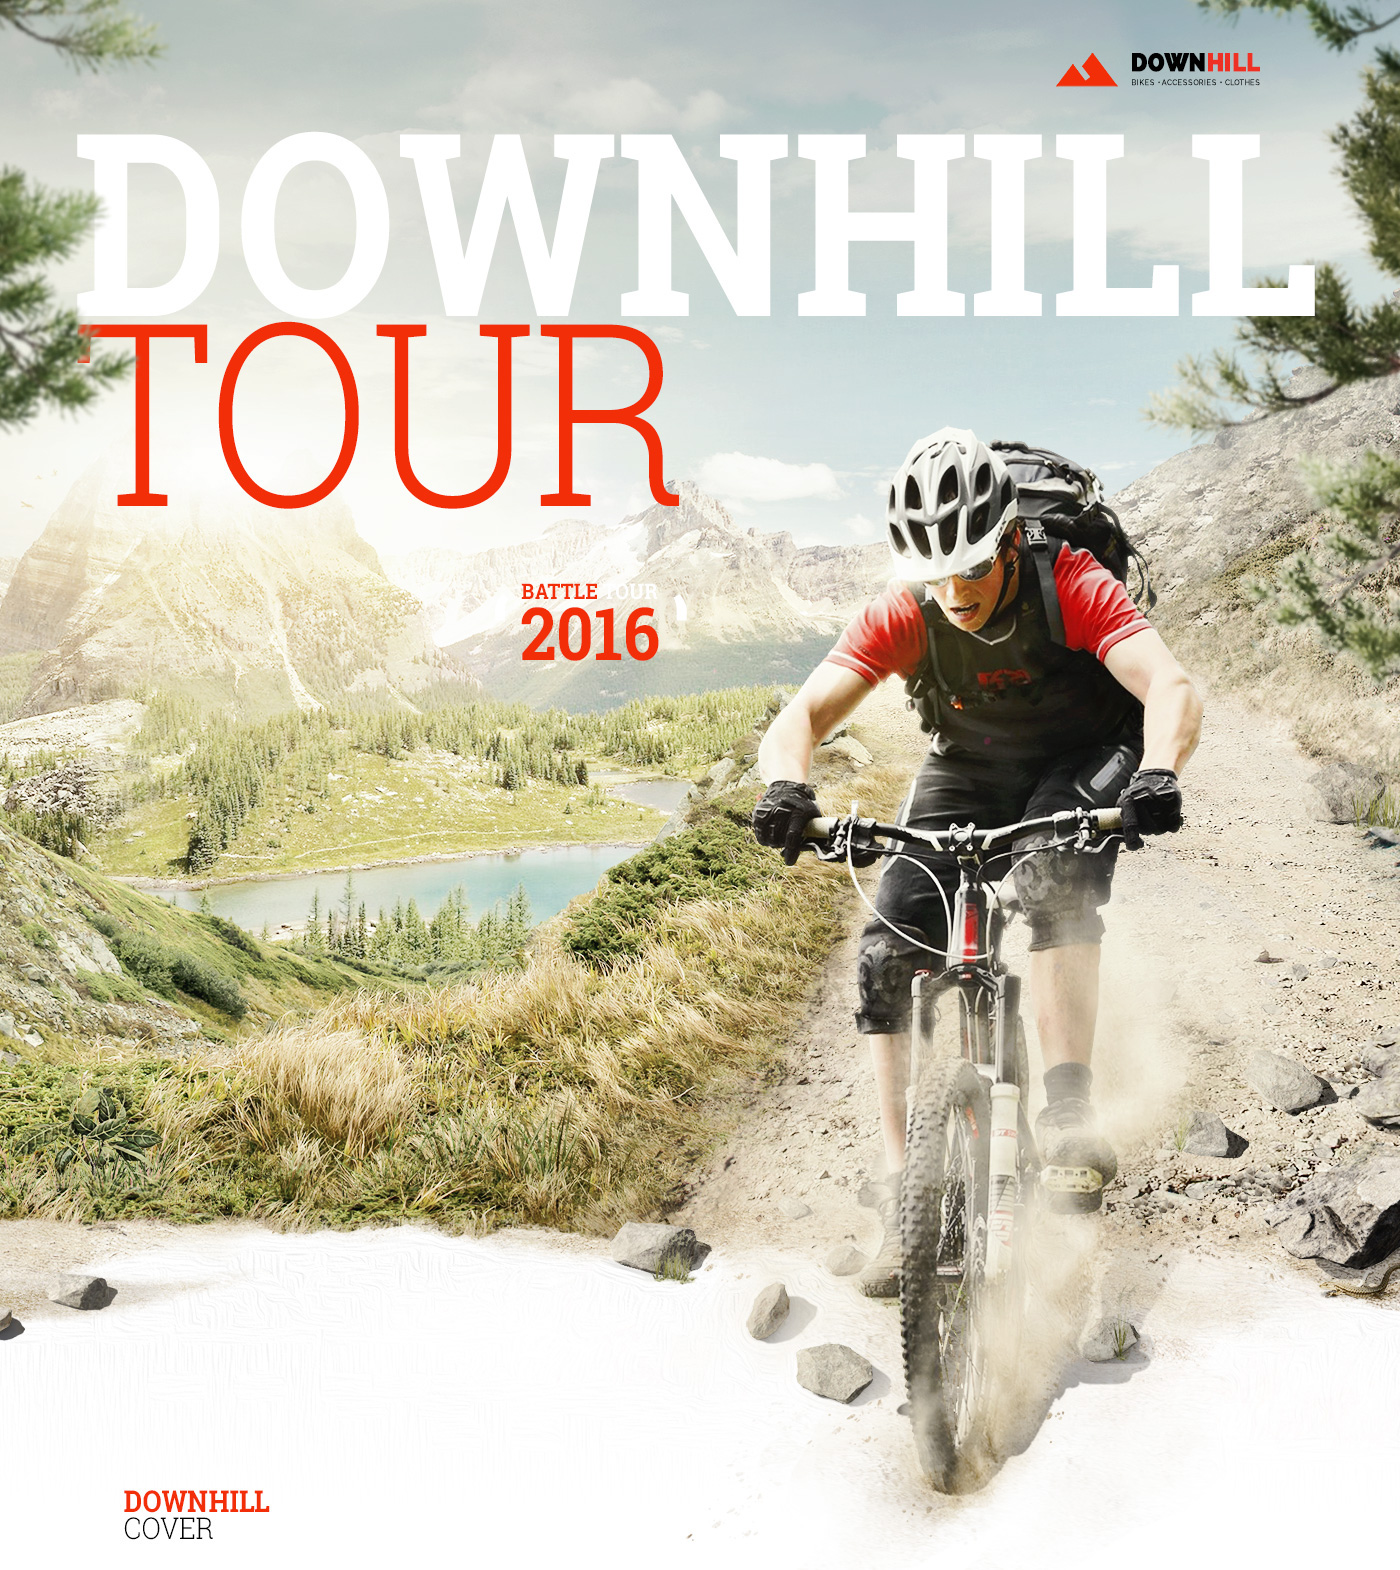 Bike downhill sport bikers cyclist tour city shop store photomanipulation visual